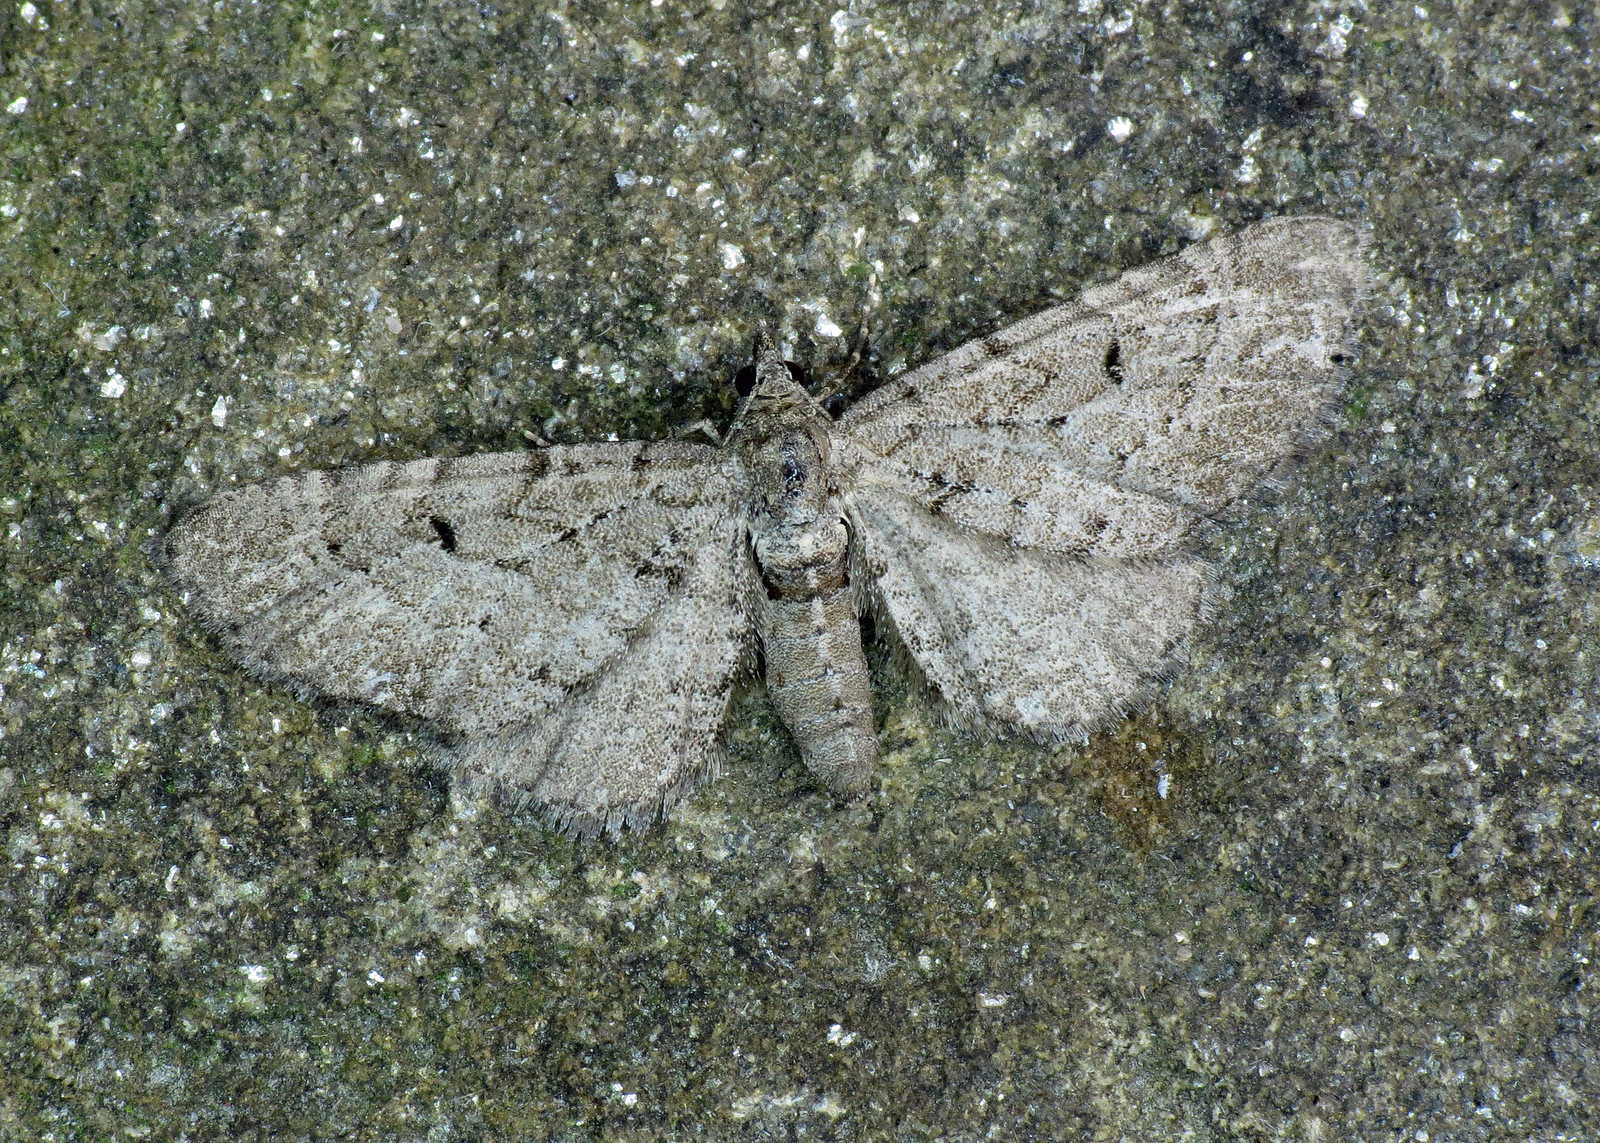 1827 Freyer's Pug - Eupithecia intricata